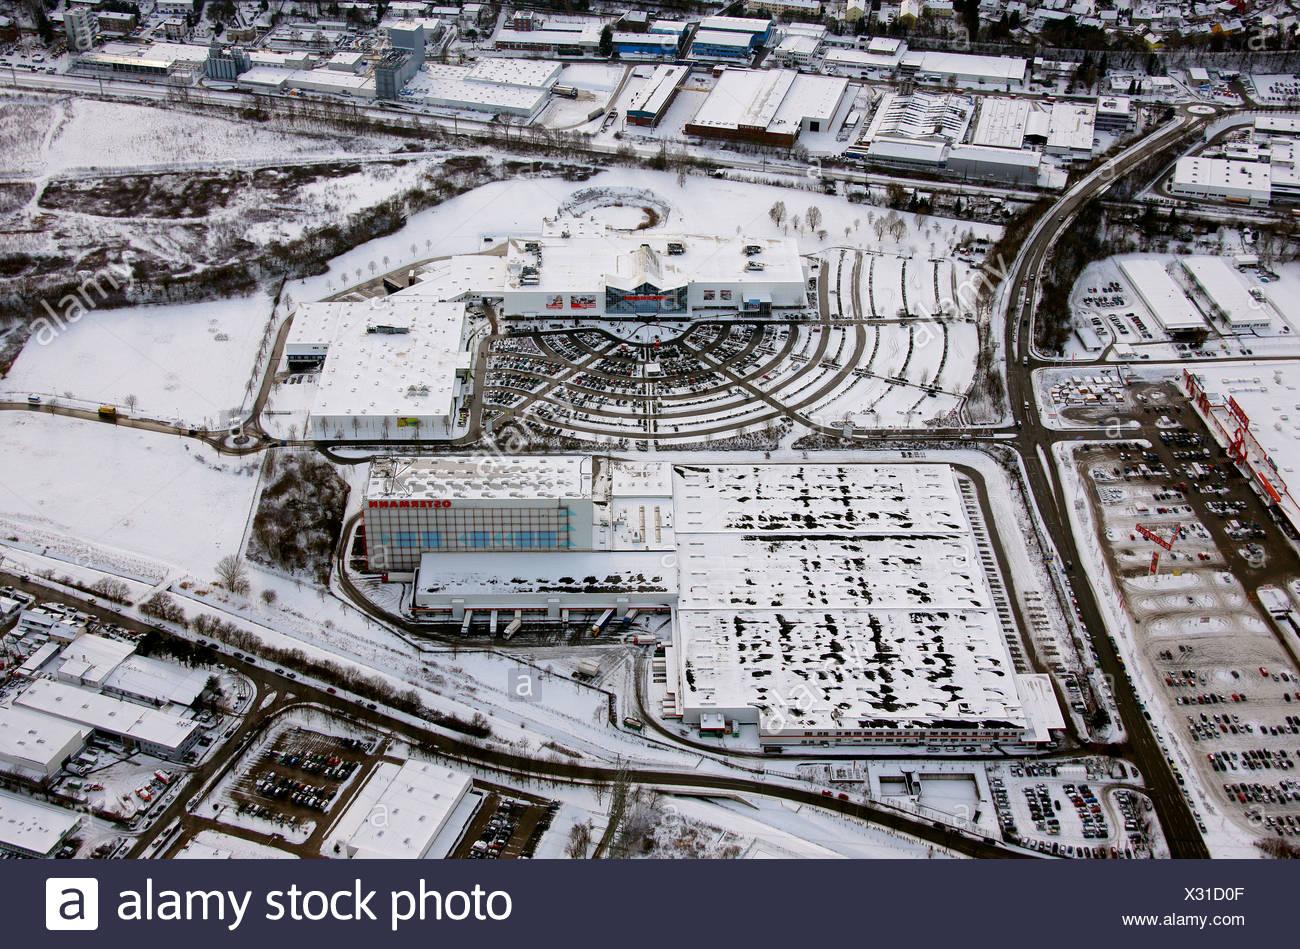 Vista aerea, furniture store Ostermann, parcheggio, neve, Witten, Ruhrgebiet regione Renania settentrionale-Vestfalia, Germania, Europa Immagini Stock